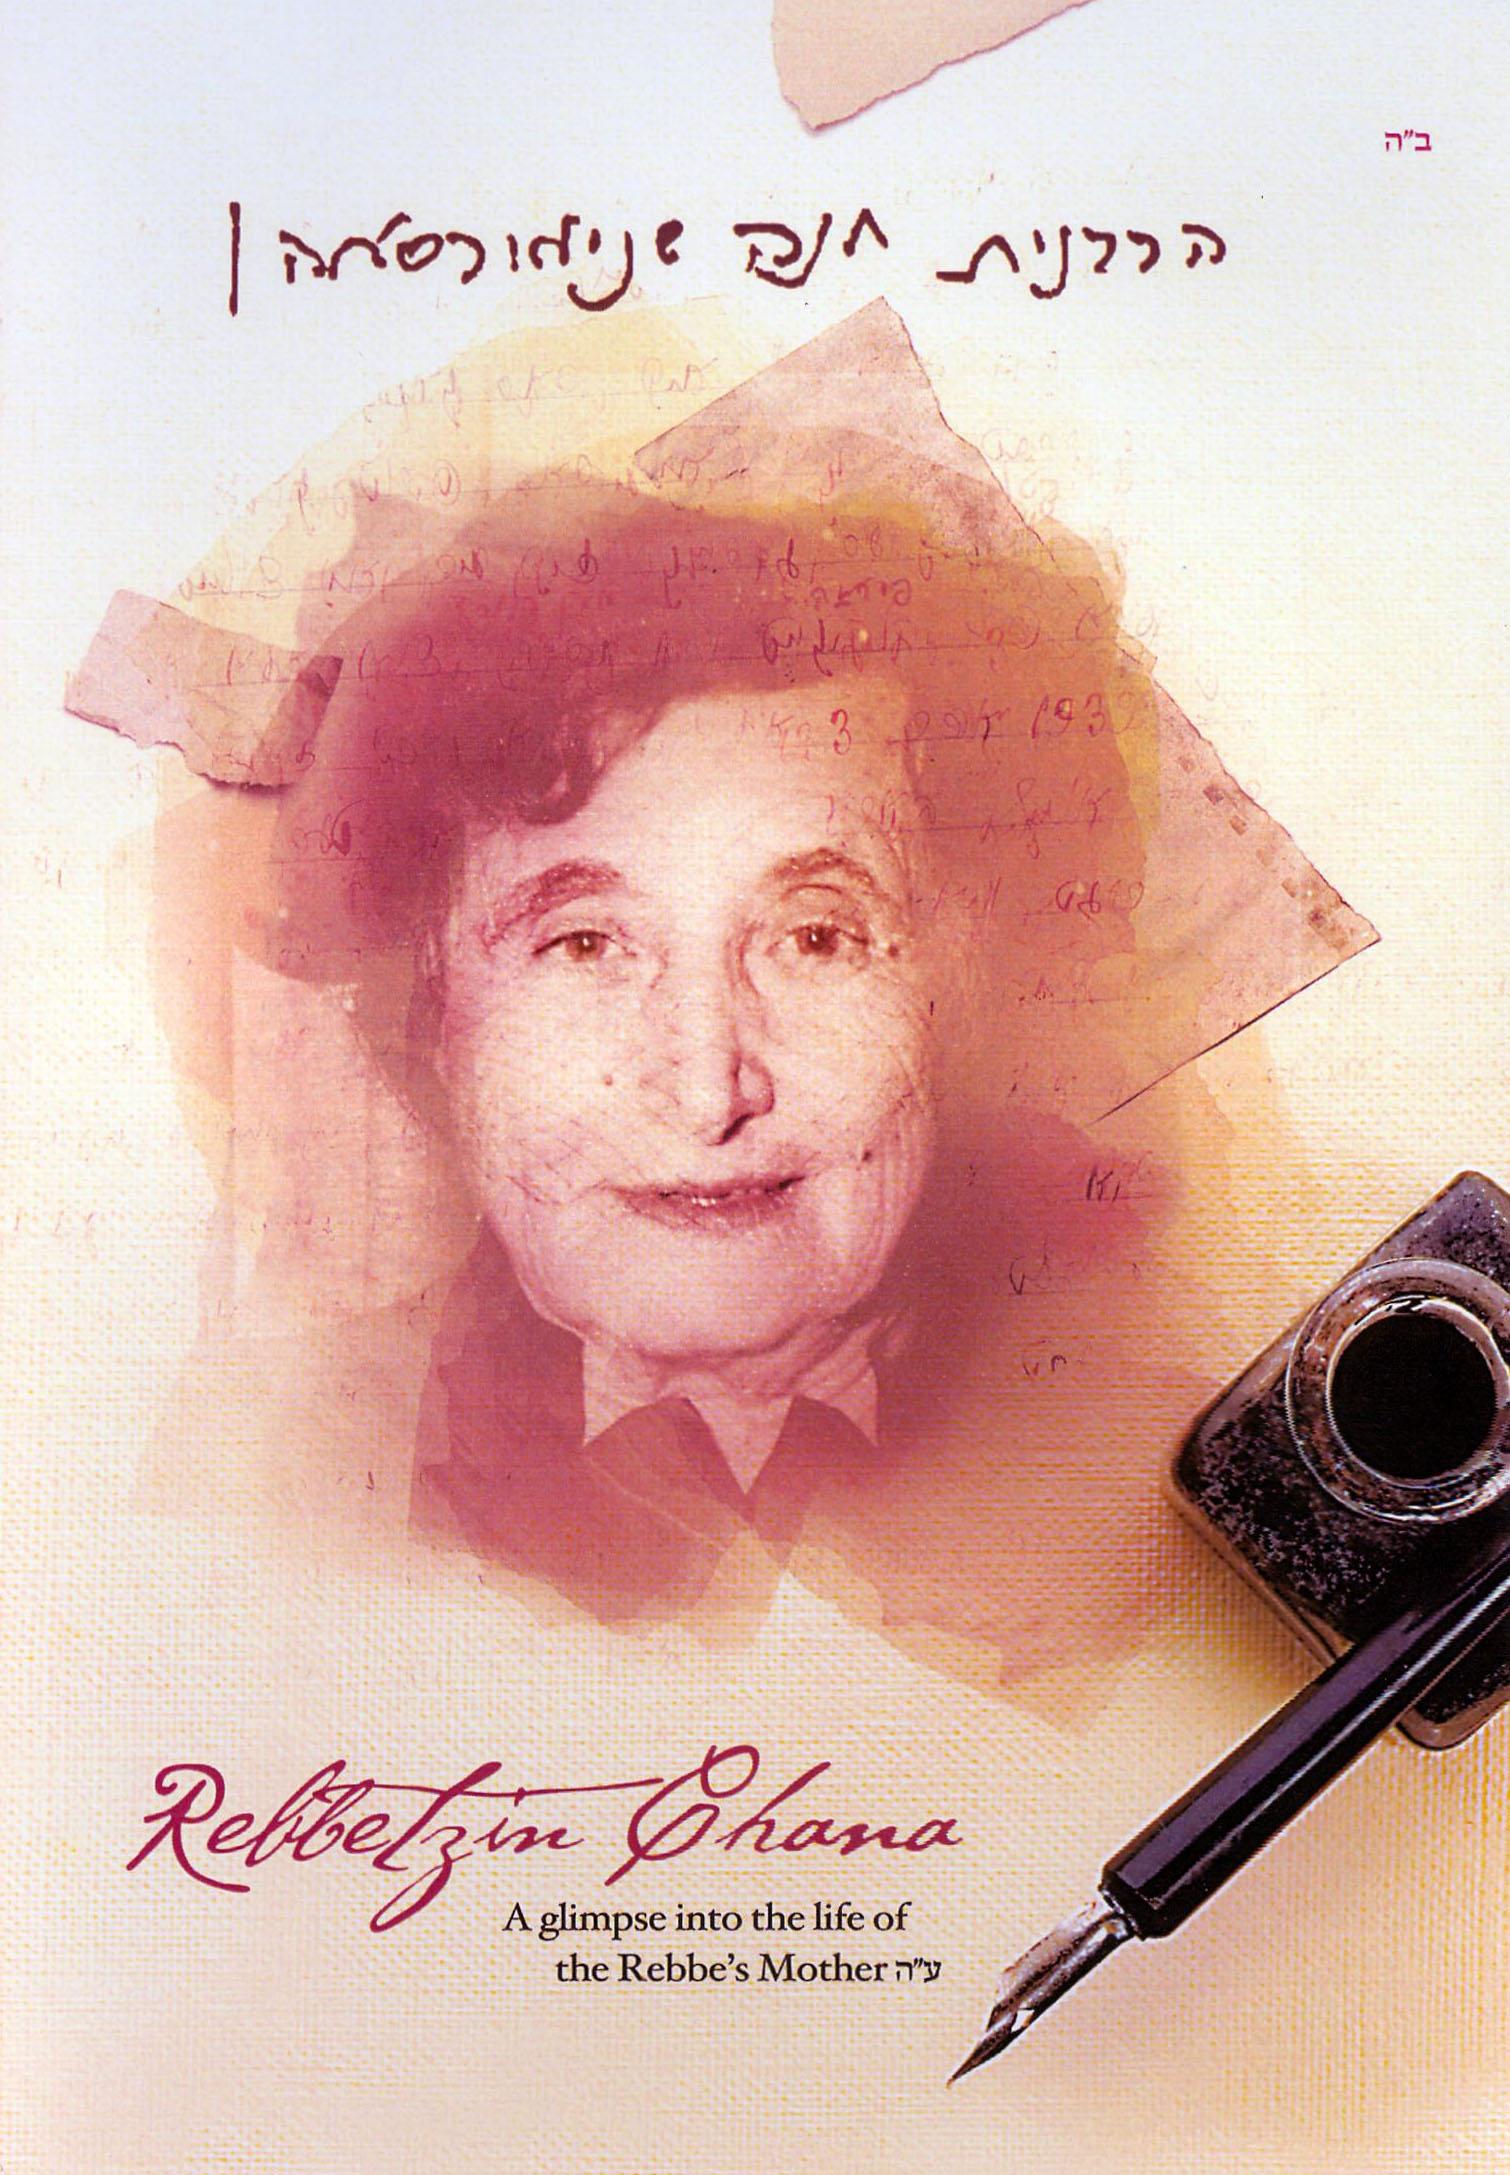 Rebbetzin Chana: A Glimpse Into the Life of the Rebbe's Mother